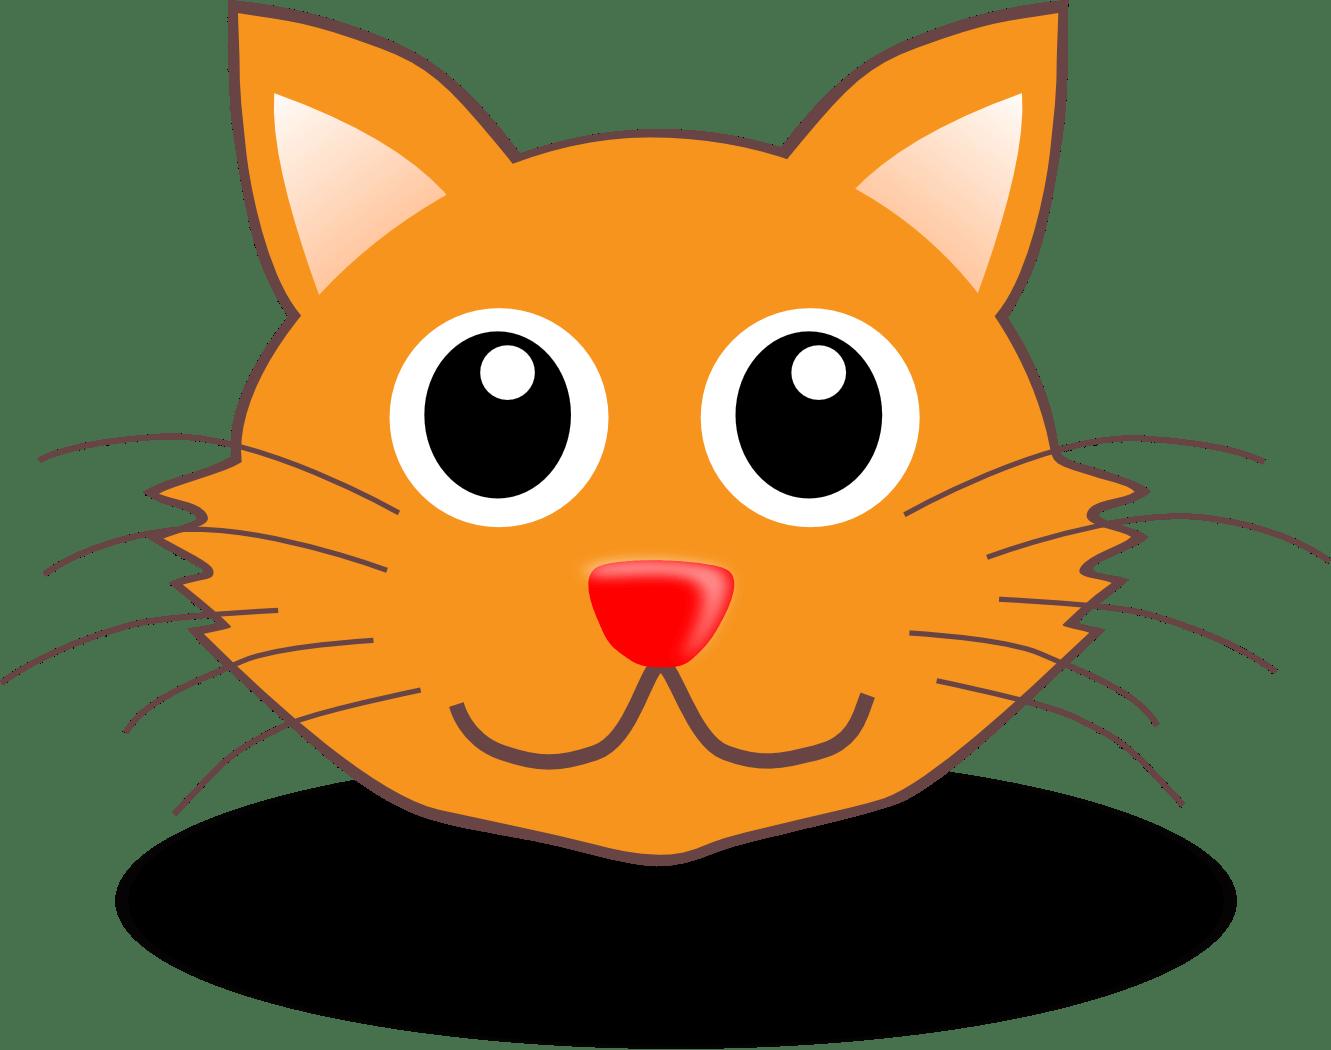 Cat Face Clipart   Clipart Panda - Free Clipart Images (1331 x 1050 Pixel)